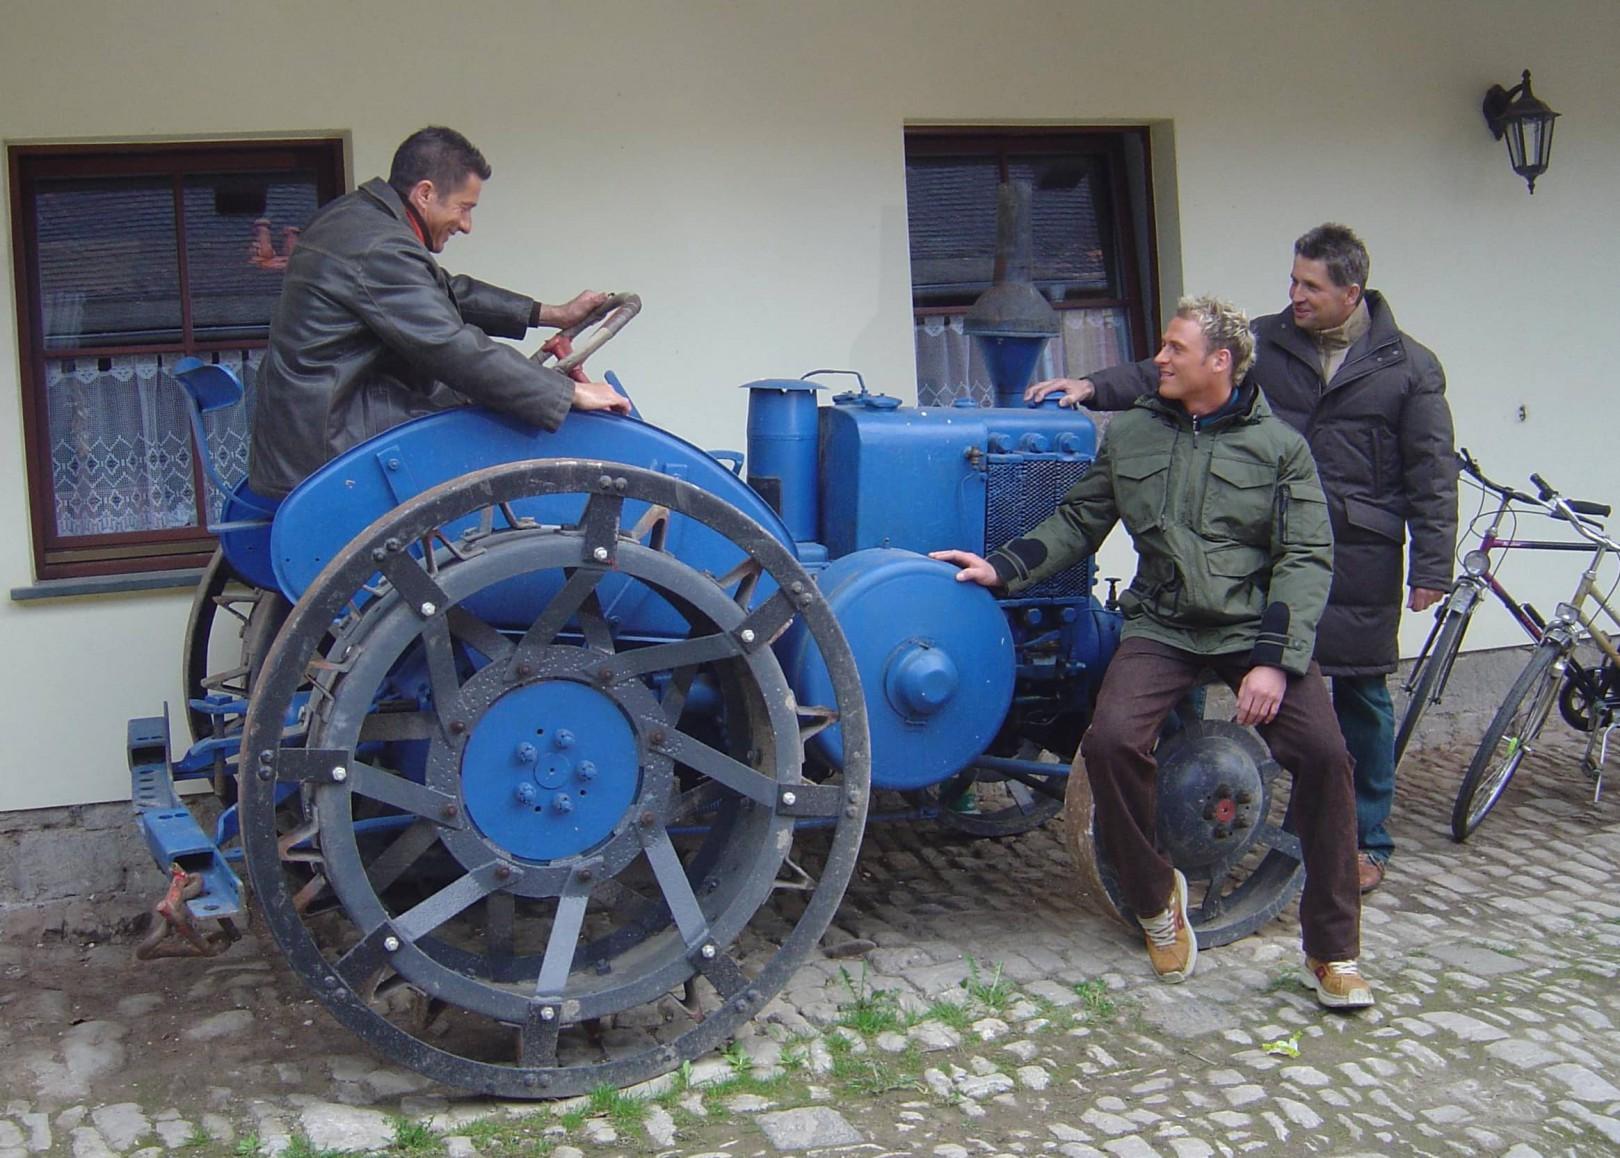 Traktoren, Museum & Heumärchen